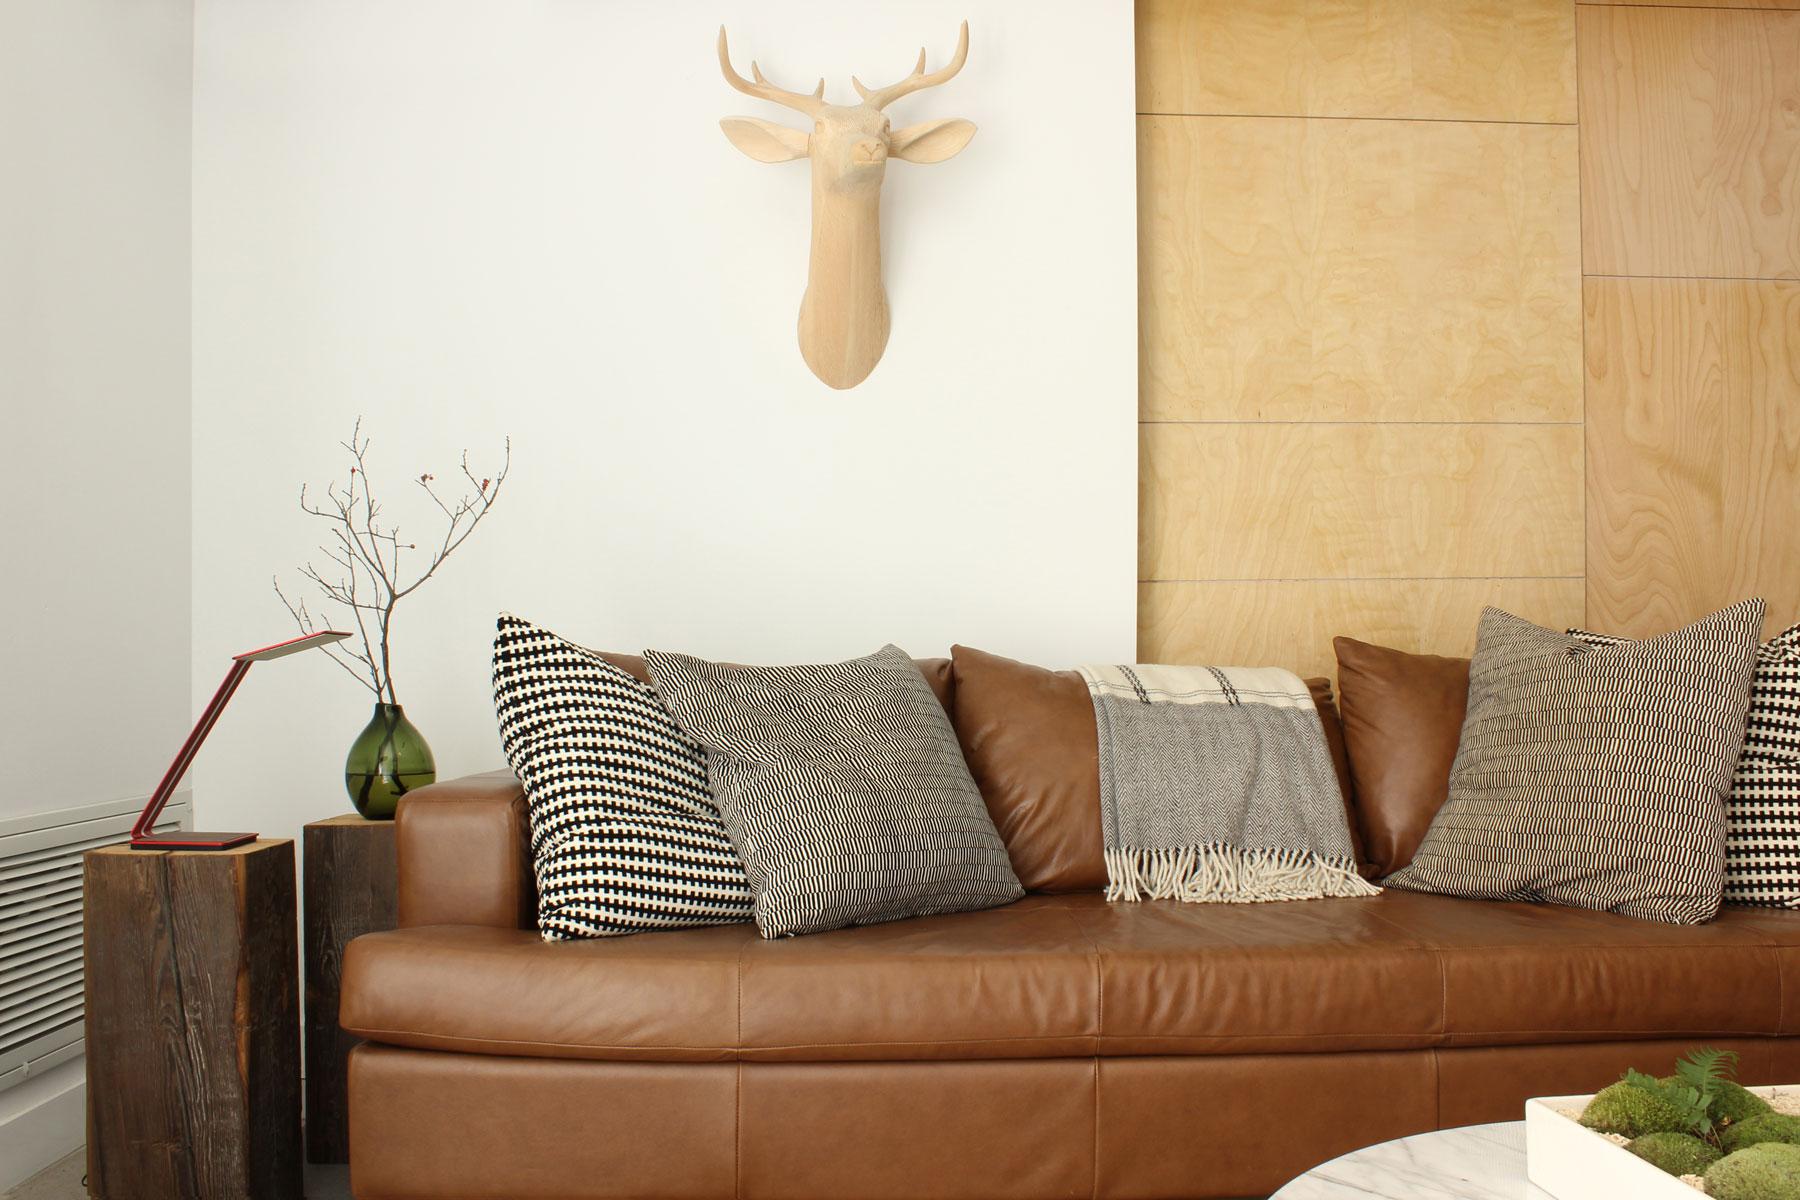 schreibtischlampe oled lampe aerelight. Black Bedroom Furniture Sets. Home Design Ideas